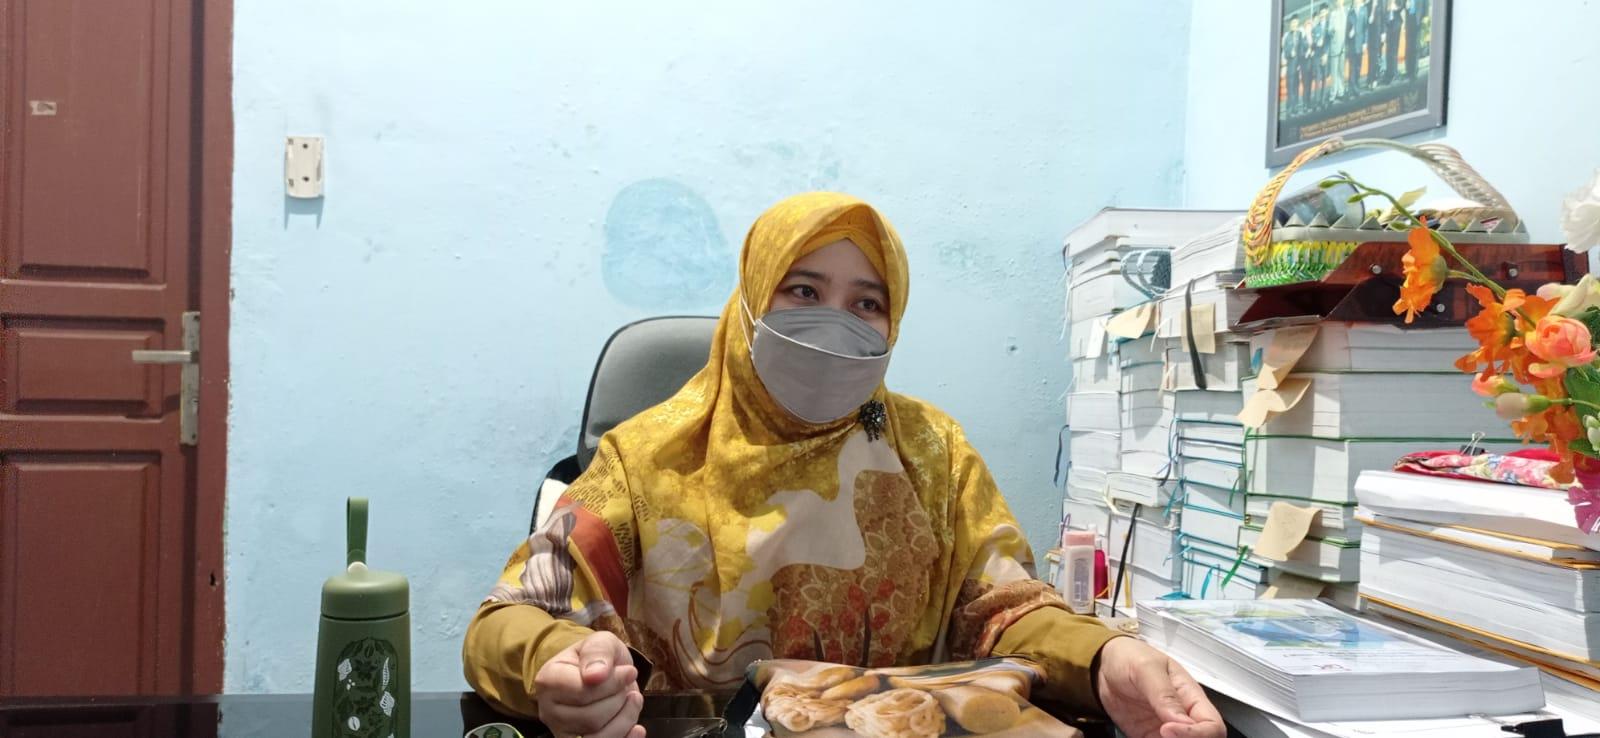 Kabid Tata Lingkungan dan Peningkatan Kapasitas Lingkungan Hidup Dinas Lingkungan Hidup dan Kebersihan Kota Palembang, Desy Elvianti SPi MSi